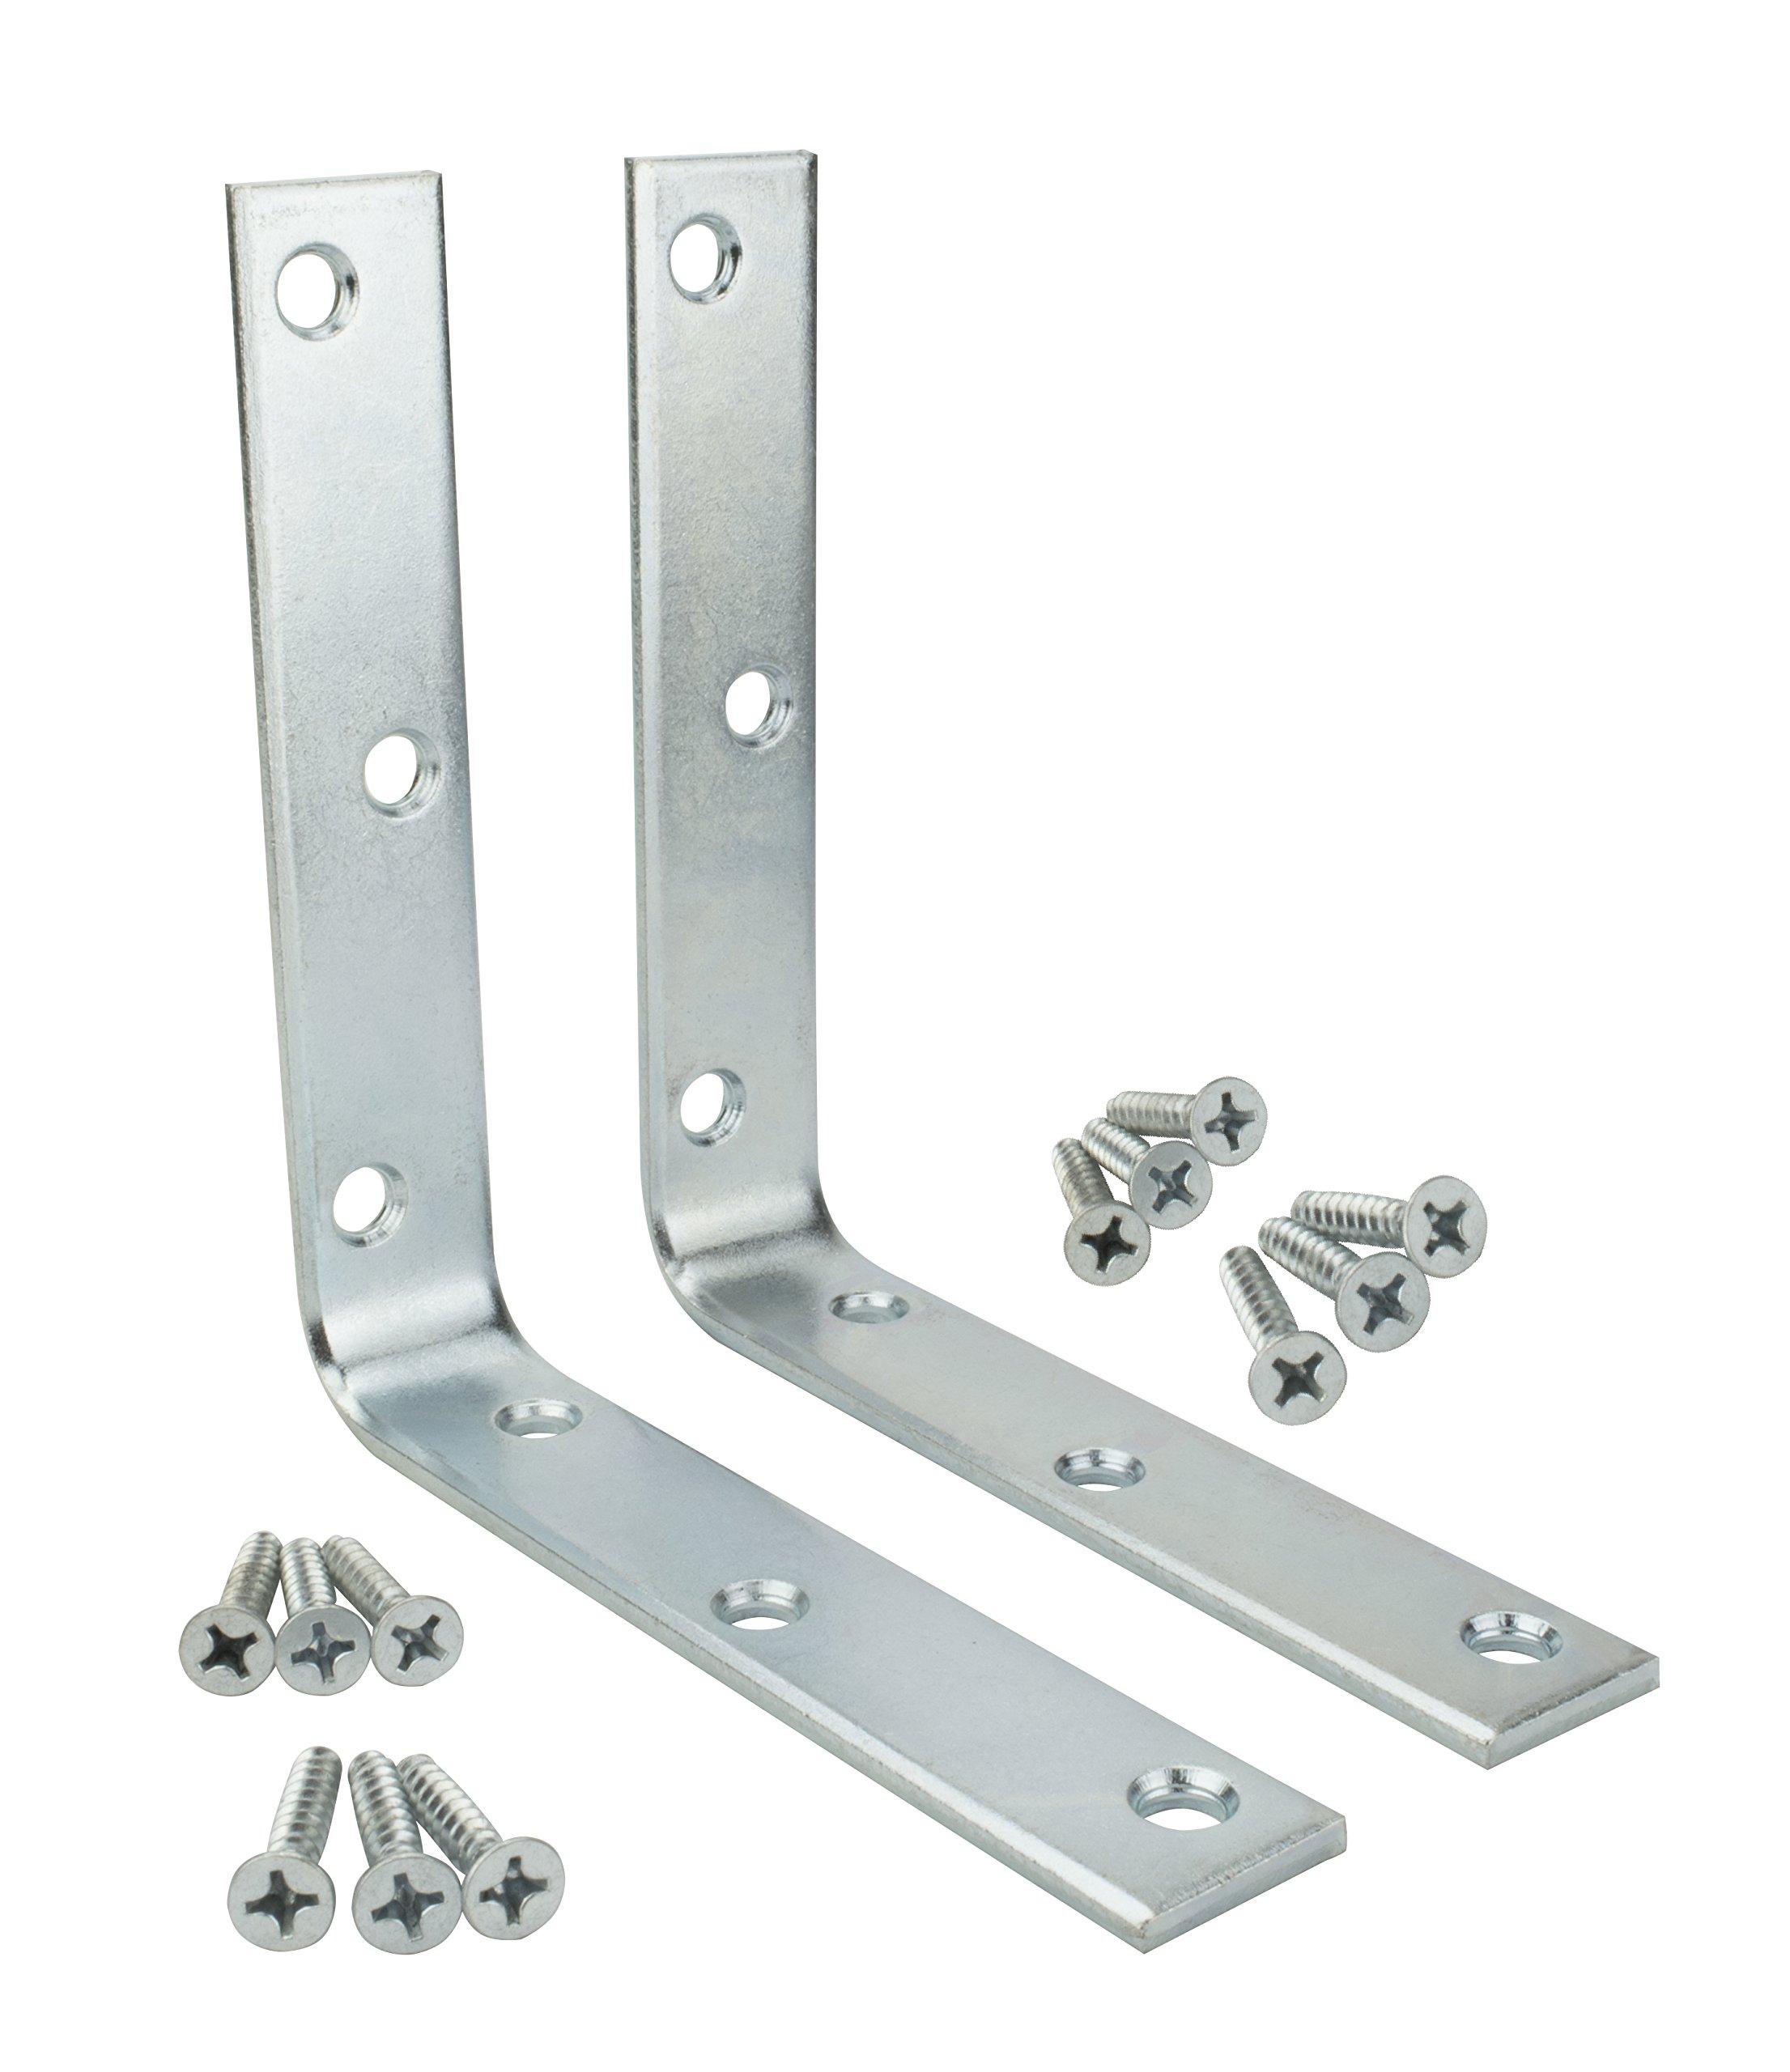 Specialty Hardware Corner Brace 6 inch Zinc Plated 20pcs